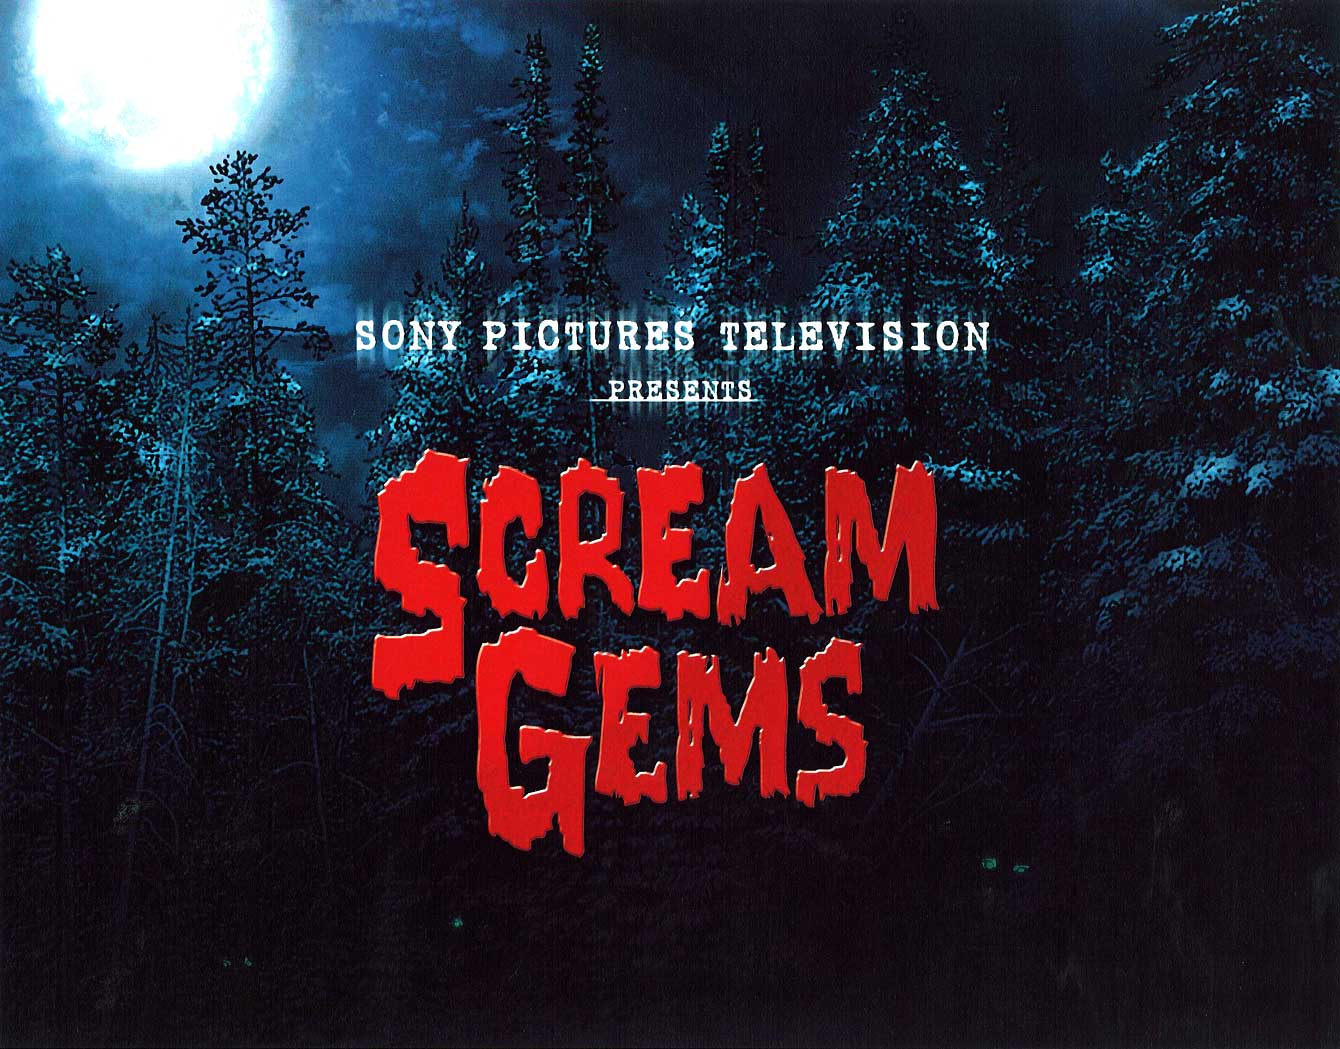 scream_gems_01